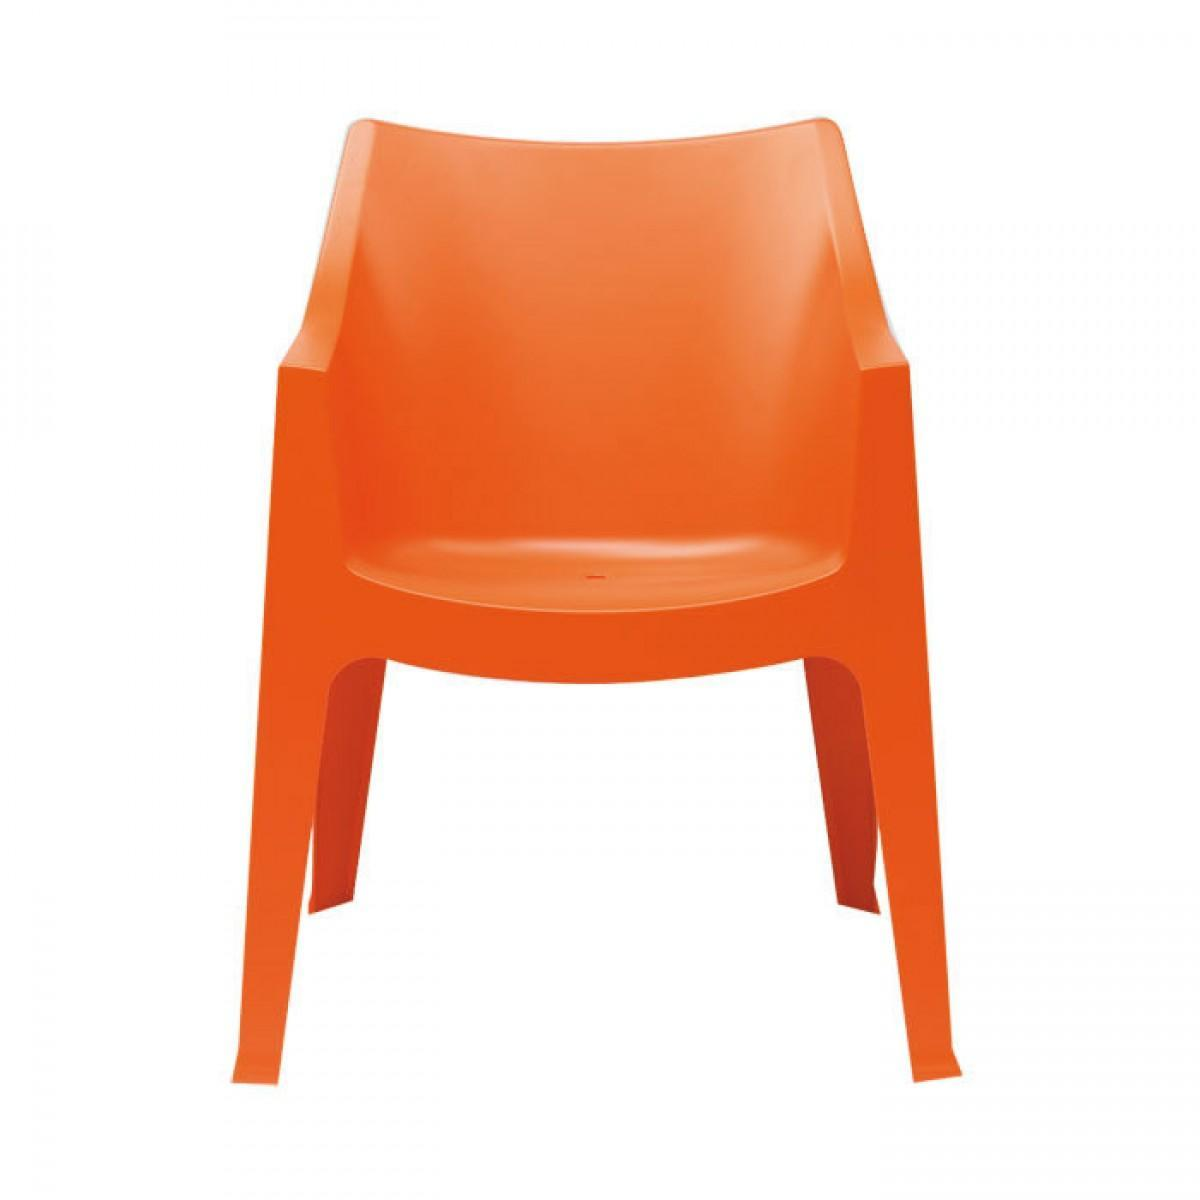 Кресло пластиковое Coccolona